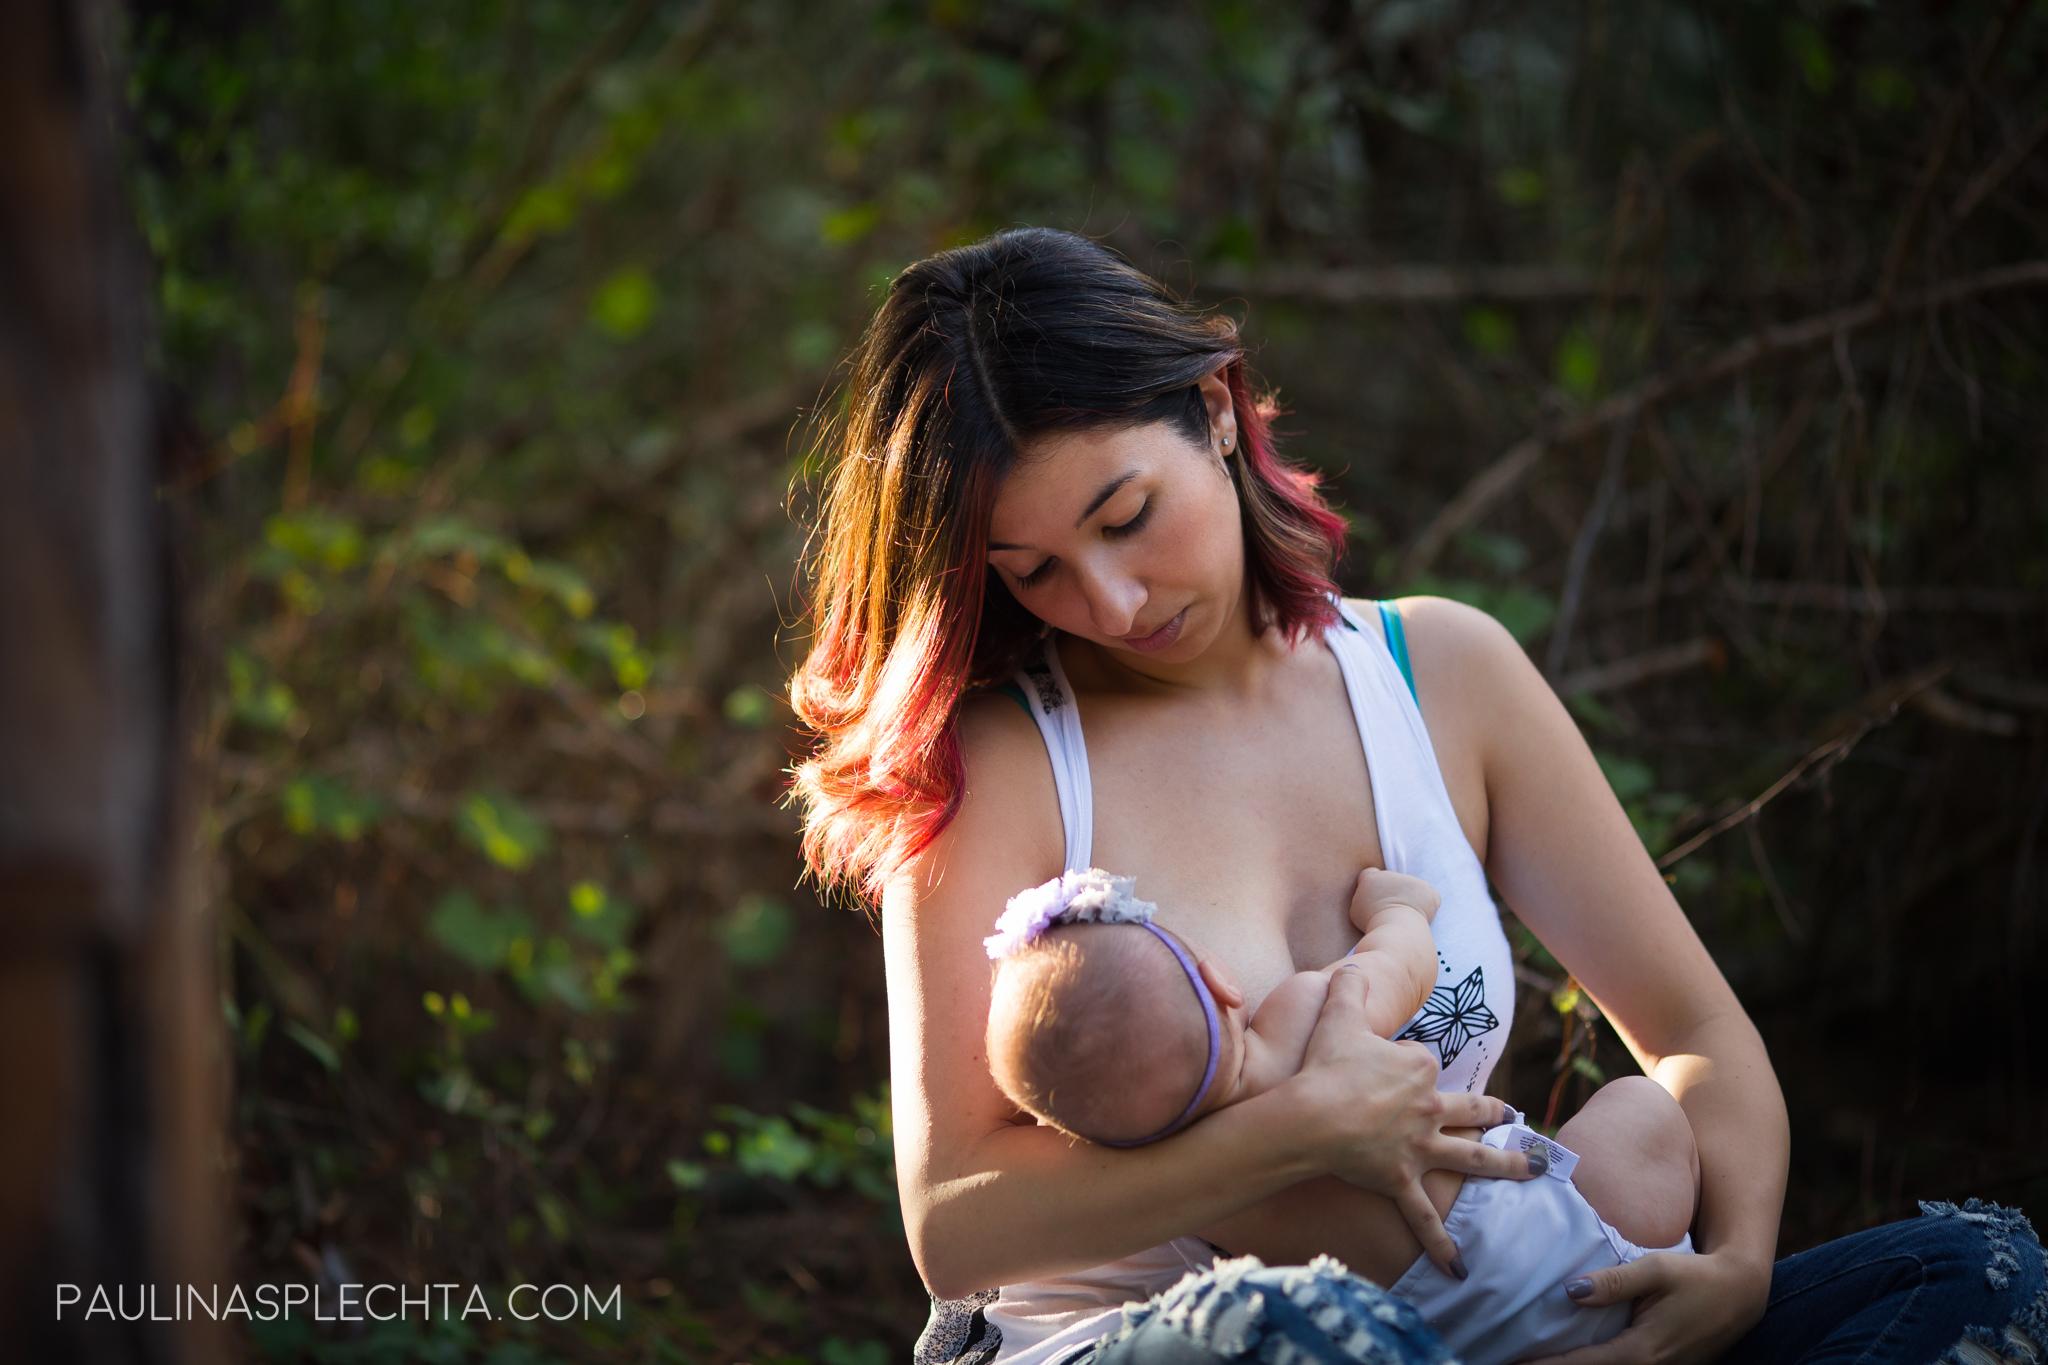 boca-raton-regional-hospital-vbac-car-birth-christine-hackshaw-kathy-fair-baby-bump-mommy-and-me-family-photographer-birth-6.jpg